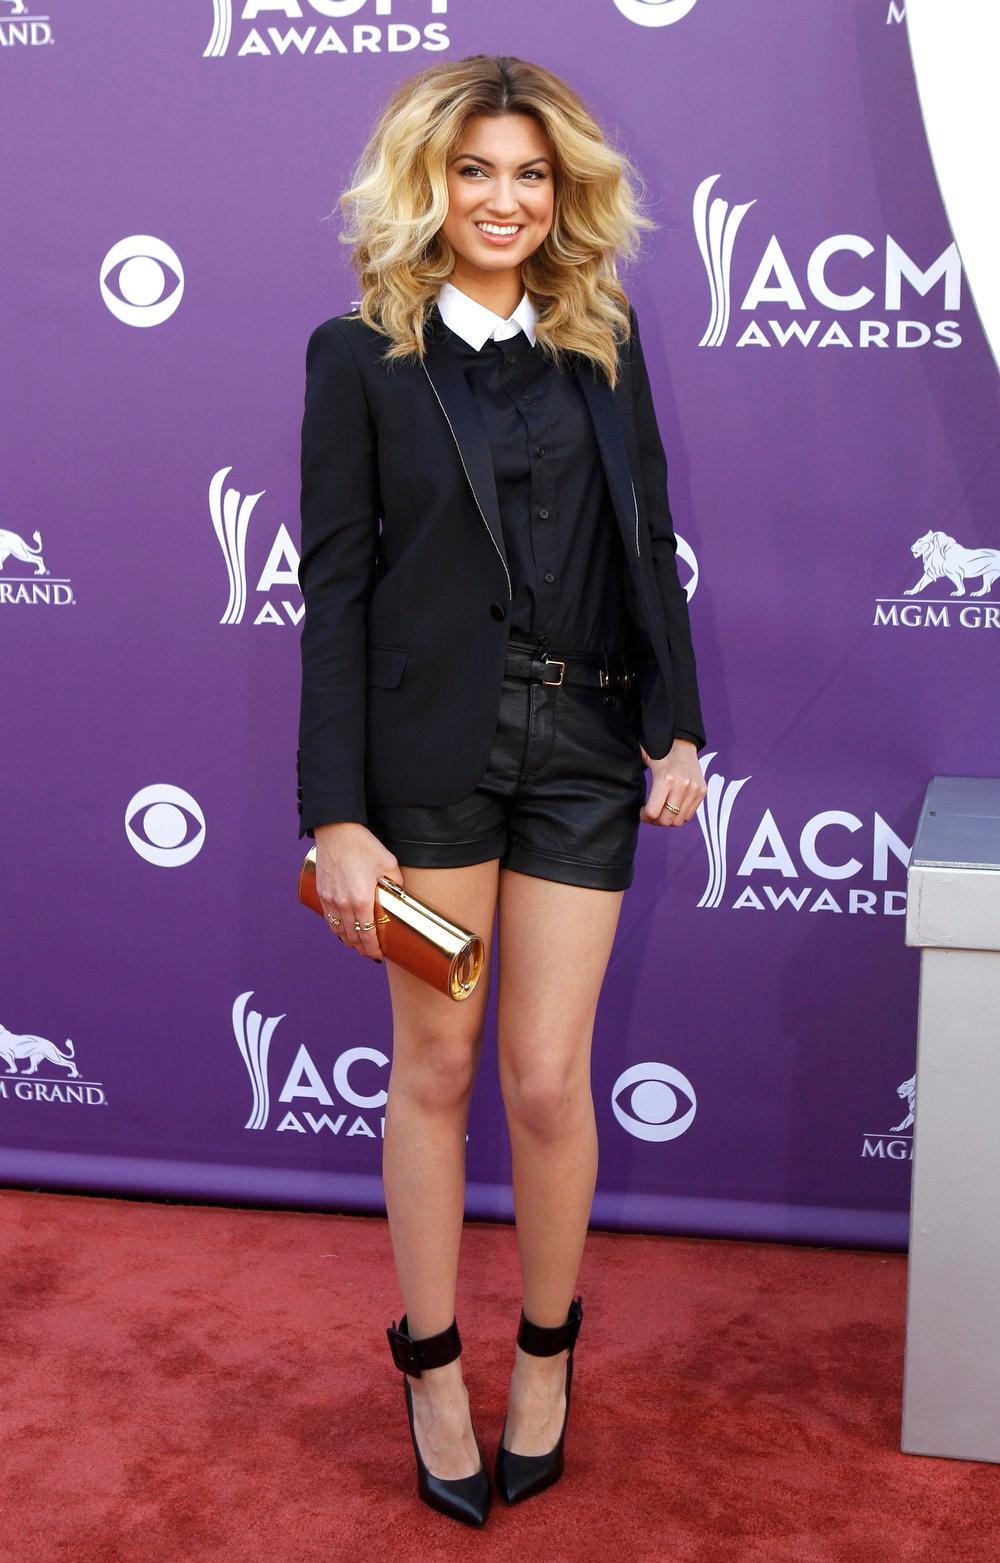 . Singer Tori Kelly arrives at the 48th ACM Awards in Las Vegas, April 7, 2013.  REUTERS/Steve Marcus